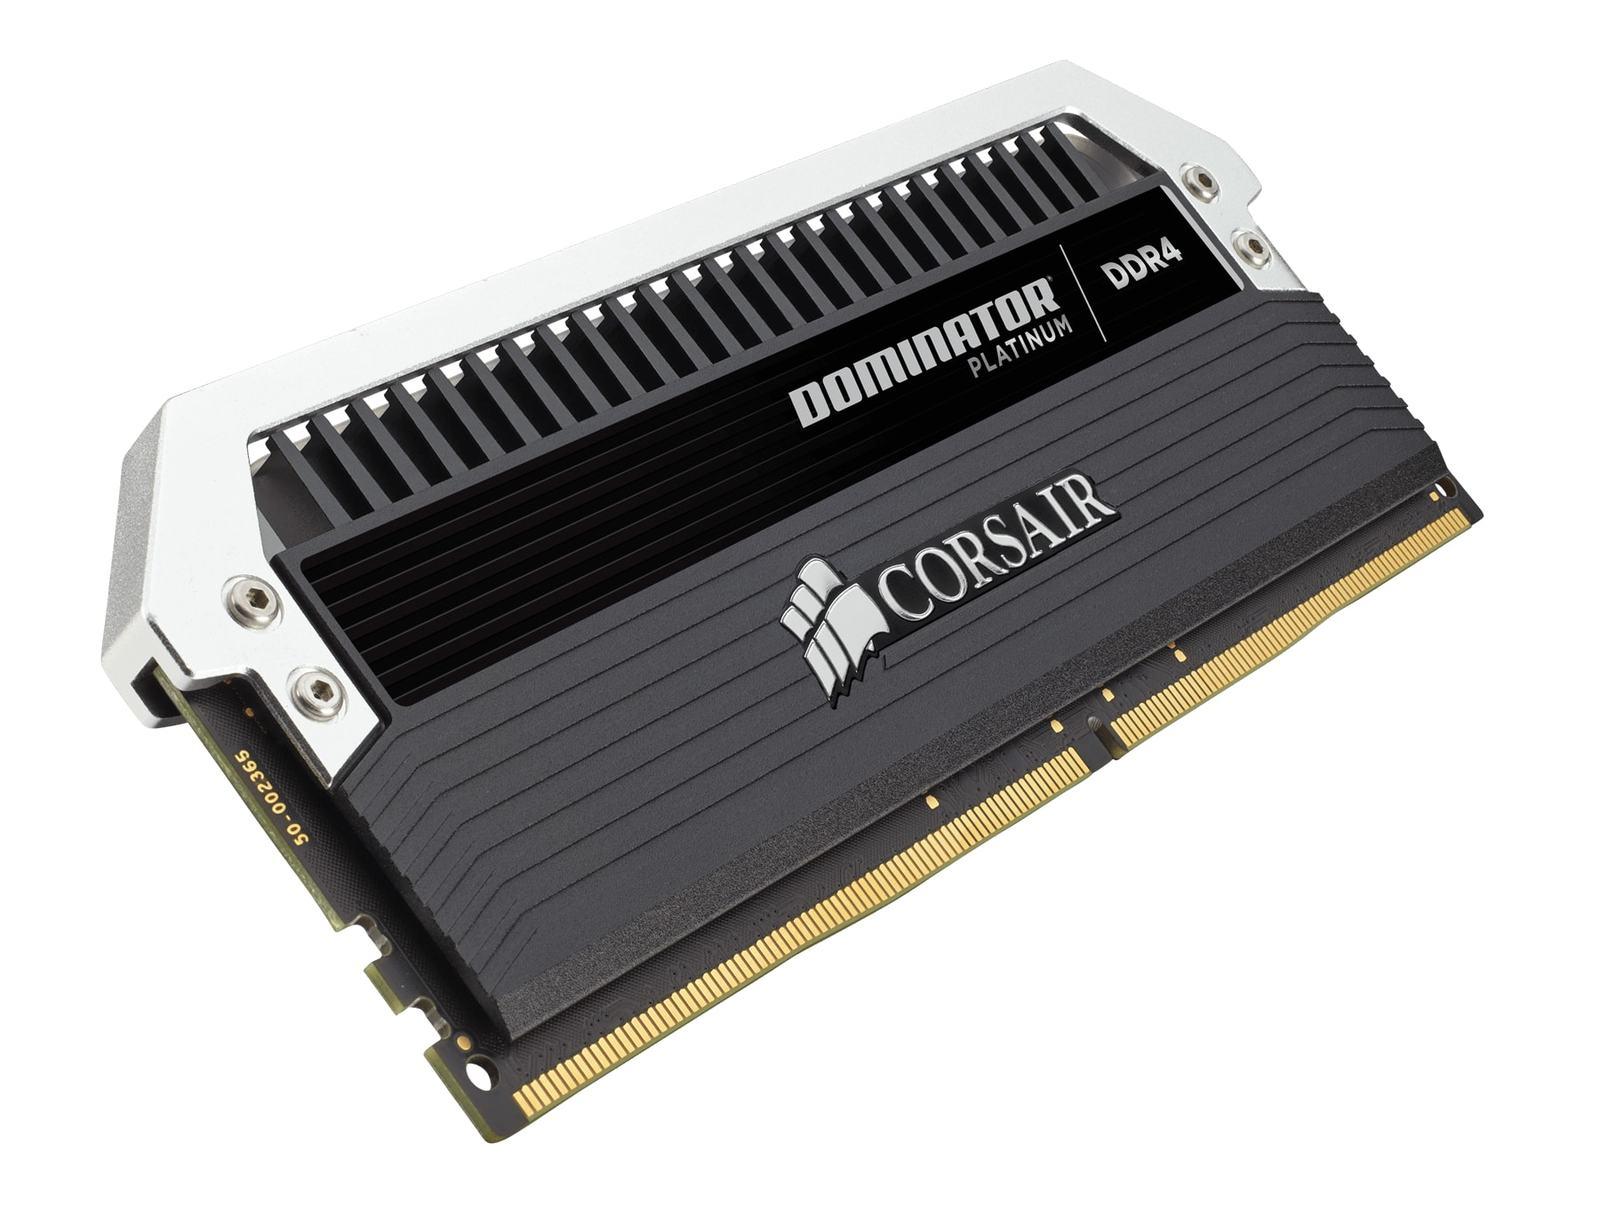 8GB Corsair Dominator Platinum Series (2 x 4GB) DDR4 DRAM 3200MHz C16 Memory Kit image